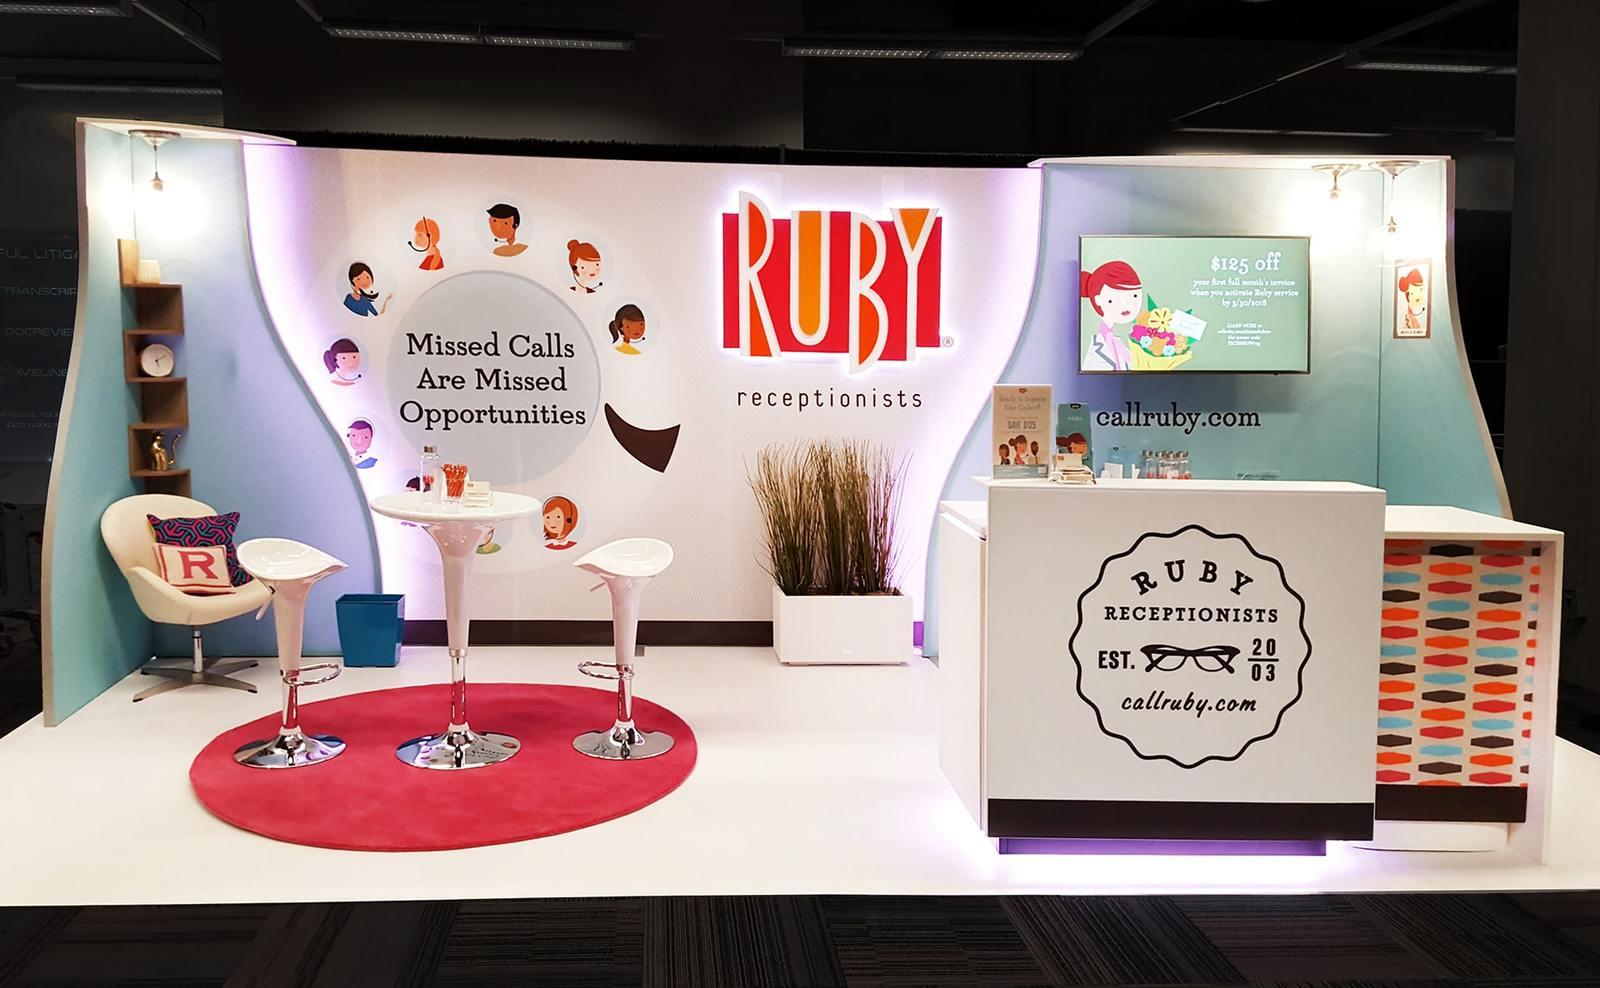 Exhibit Design Ideas & Inspiration - Trade Show Displays